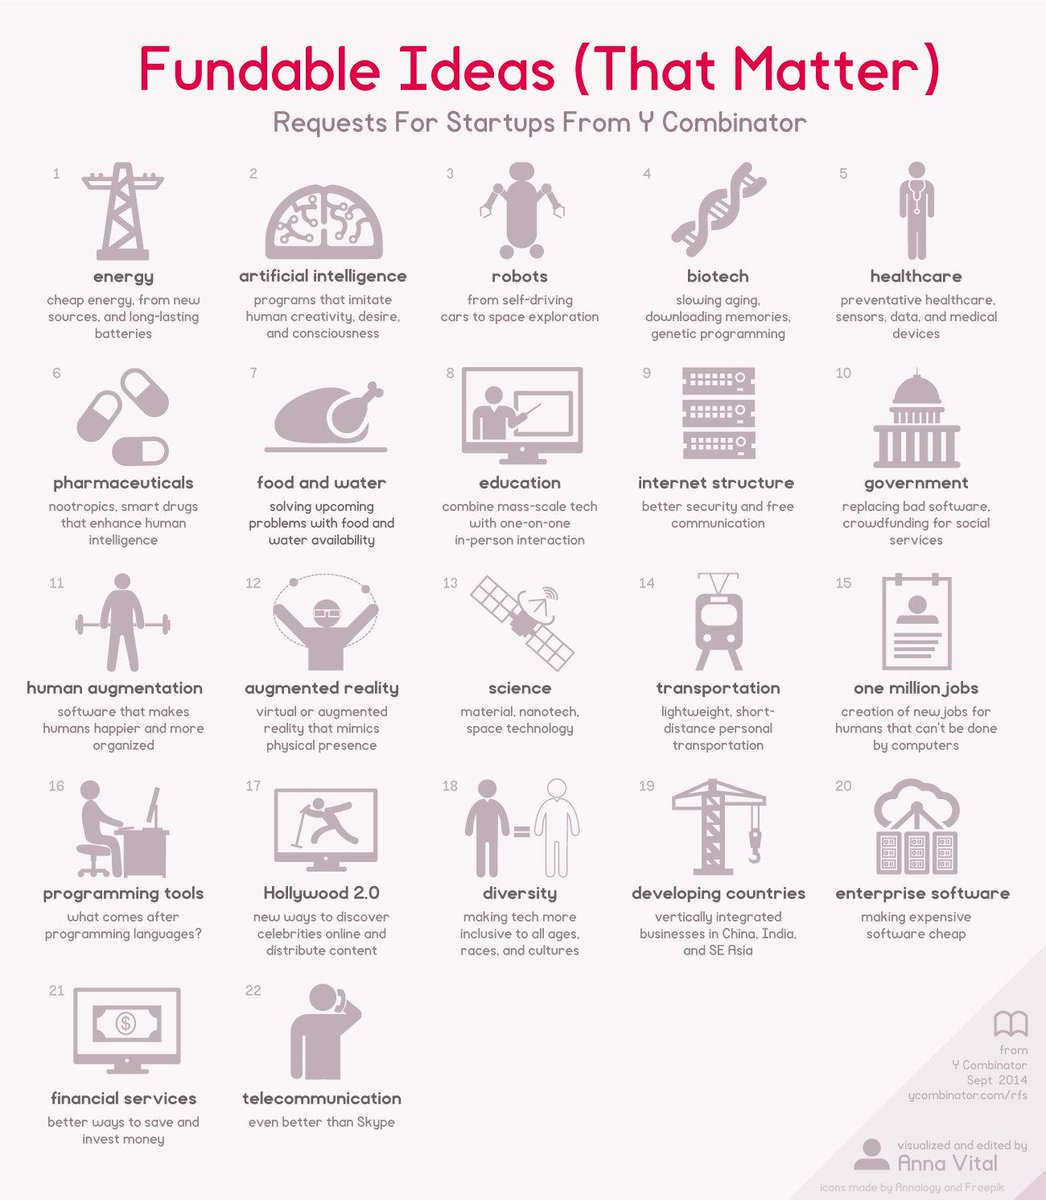 """@startupturkey: Fundable Ideas - that matter http://t.co/uM3fouxnK4"" اى حاجة وكل حاجة"